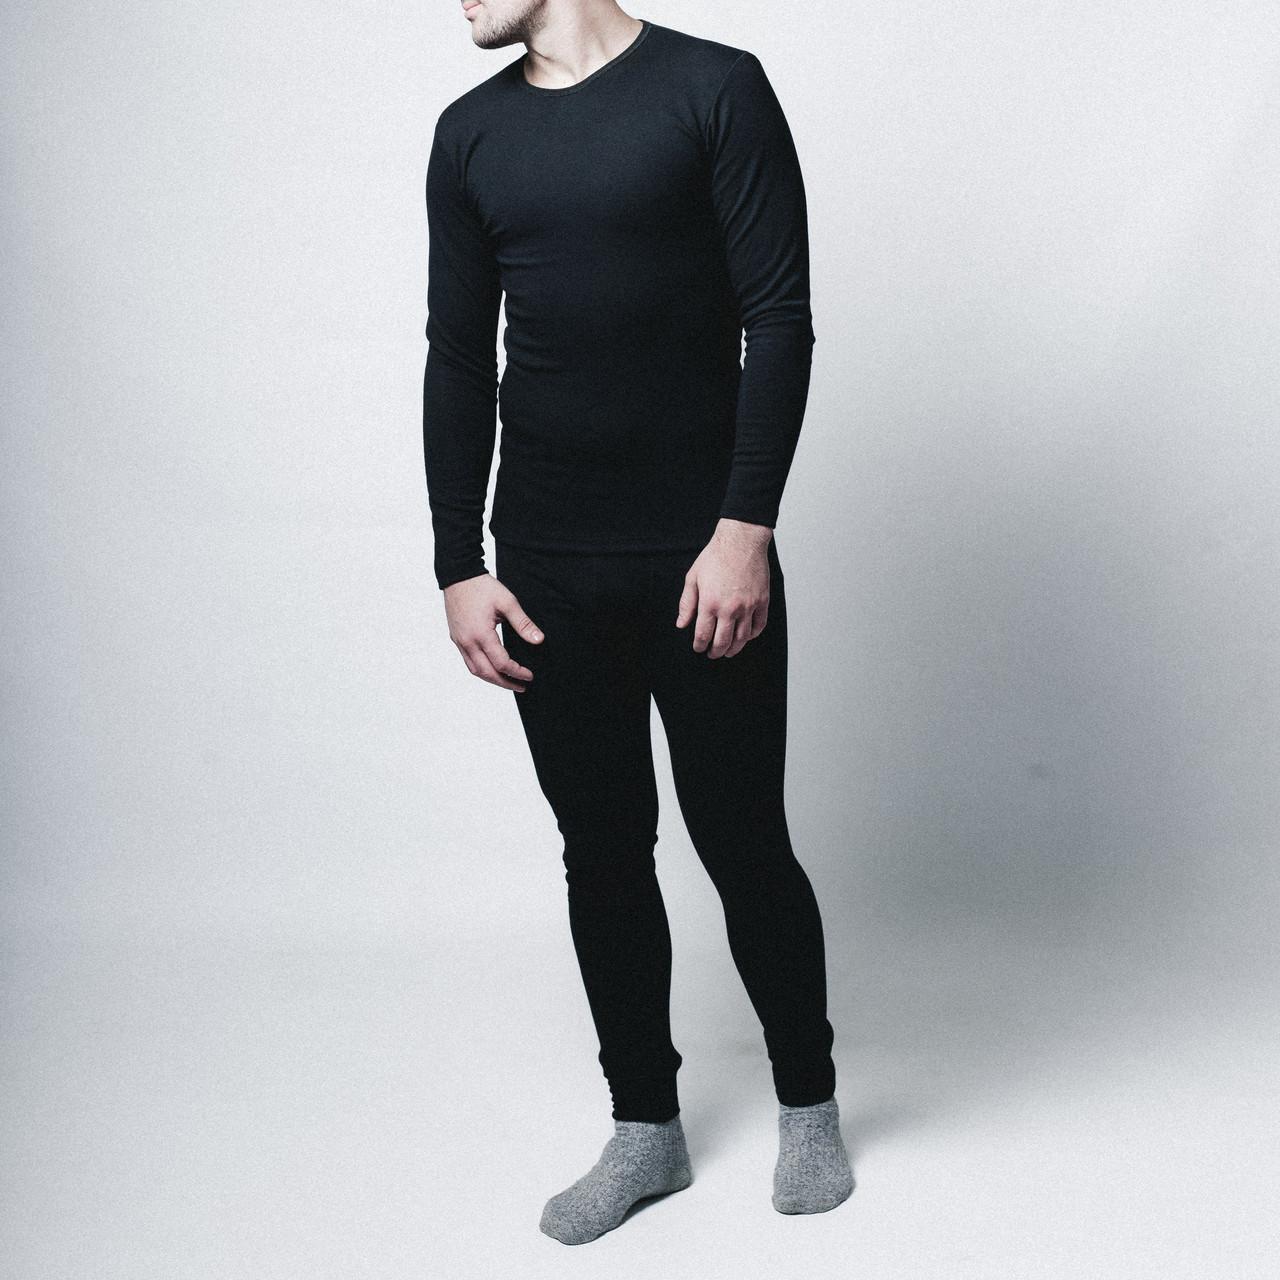 Термобелье мужское черное от бренда Morning Star размер S, M, L, XL